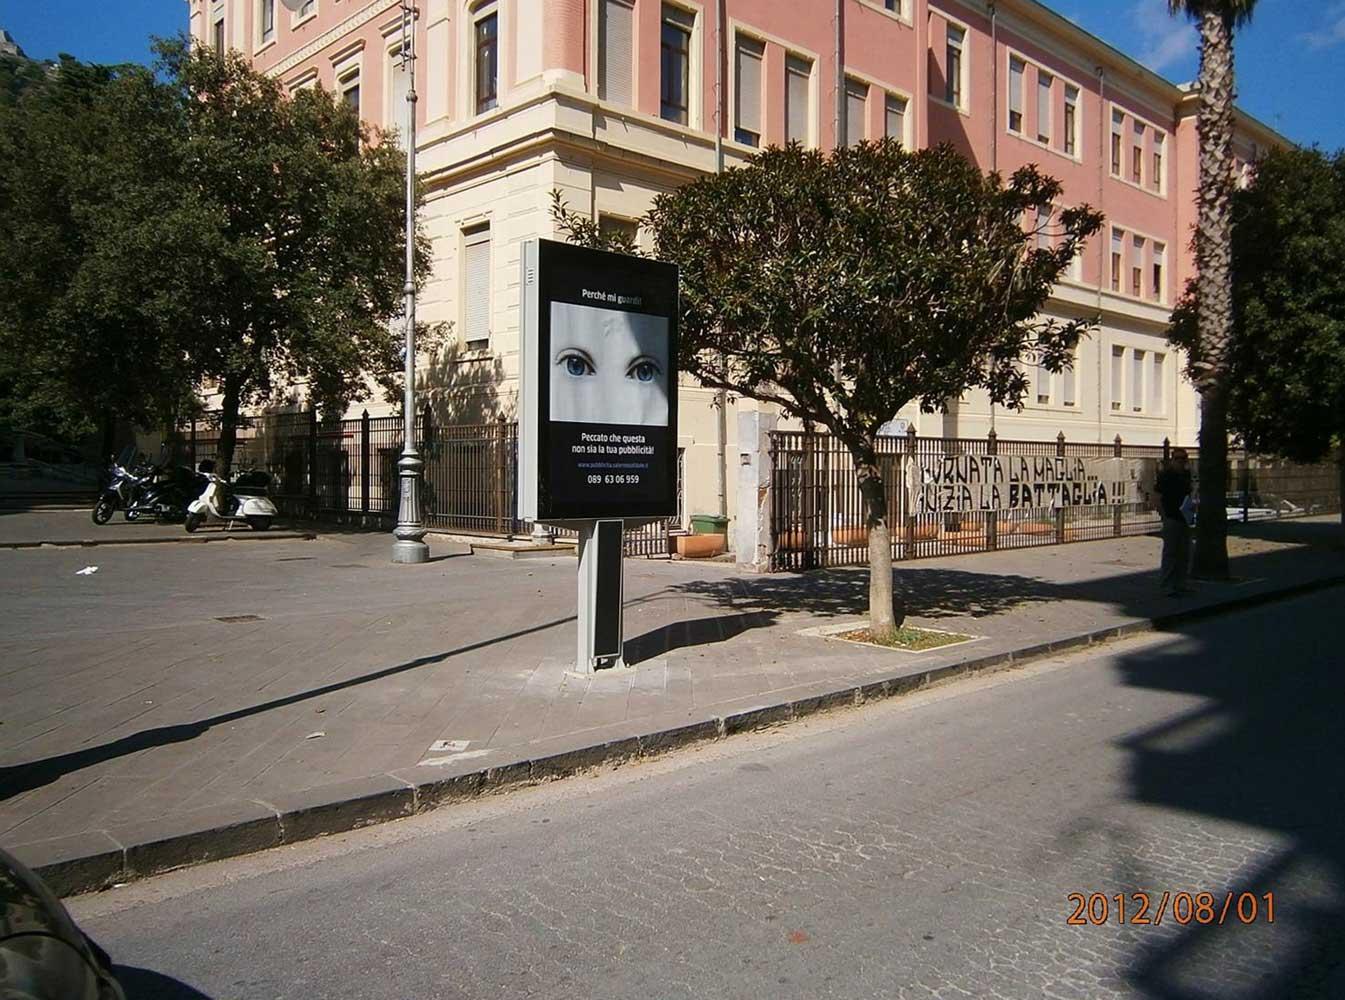 2. Via S. Pertini